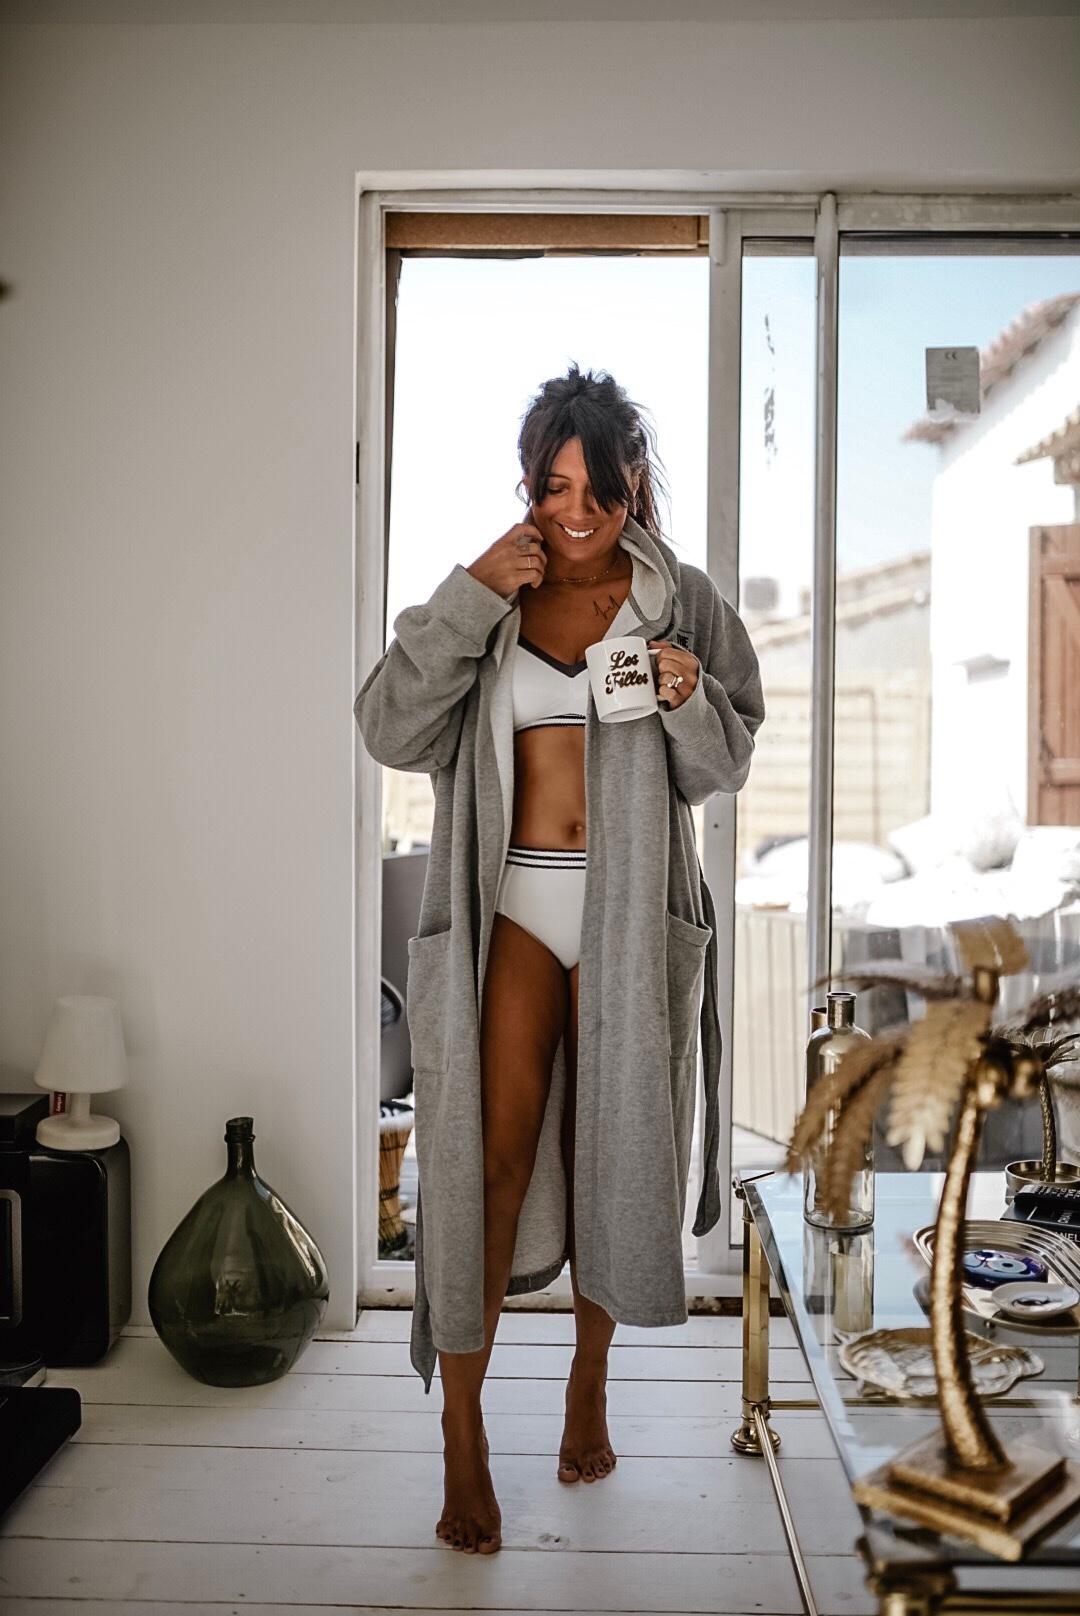 dorisknowsfashion blog mode playtex lingerie